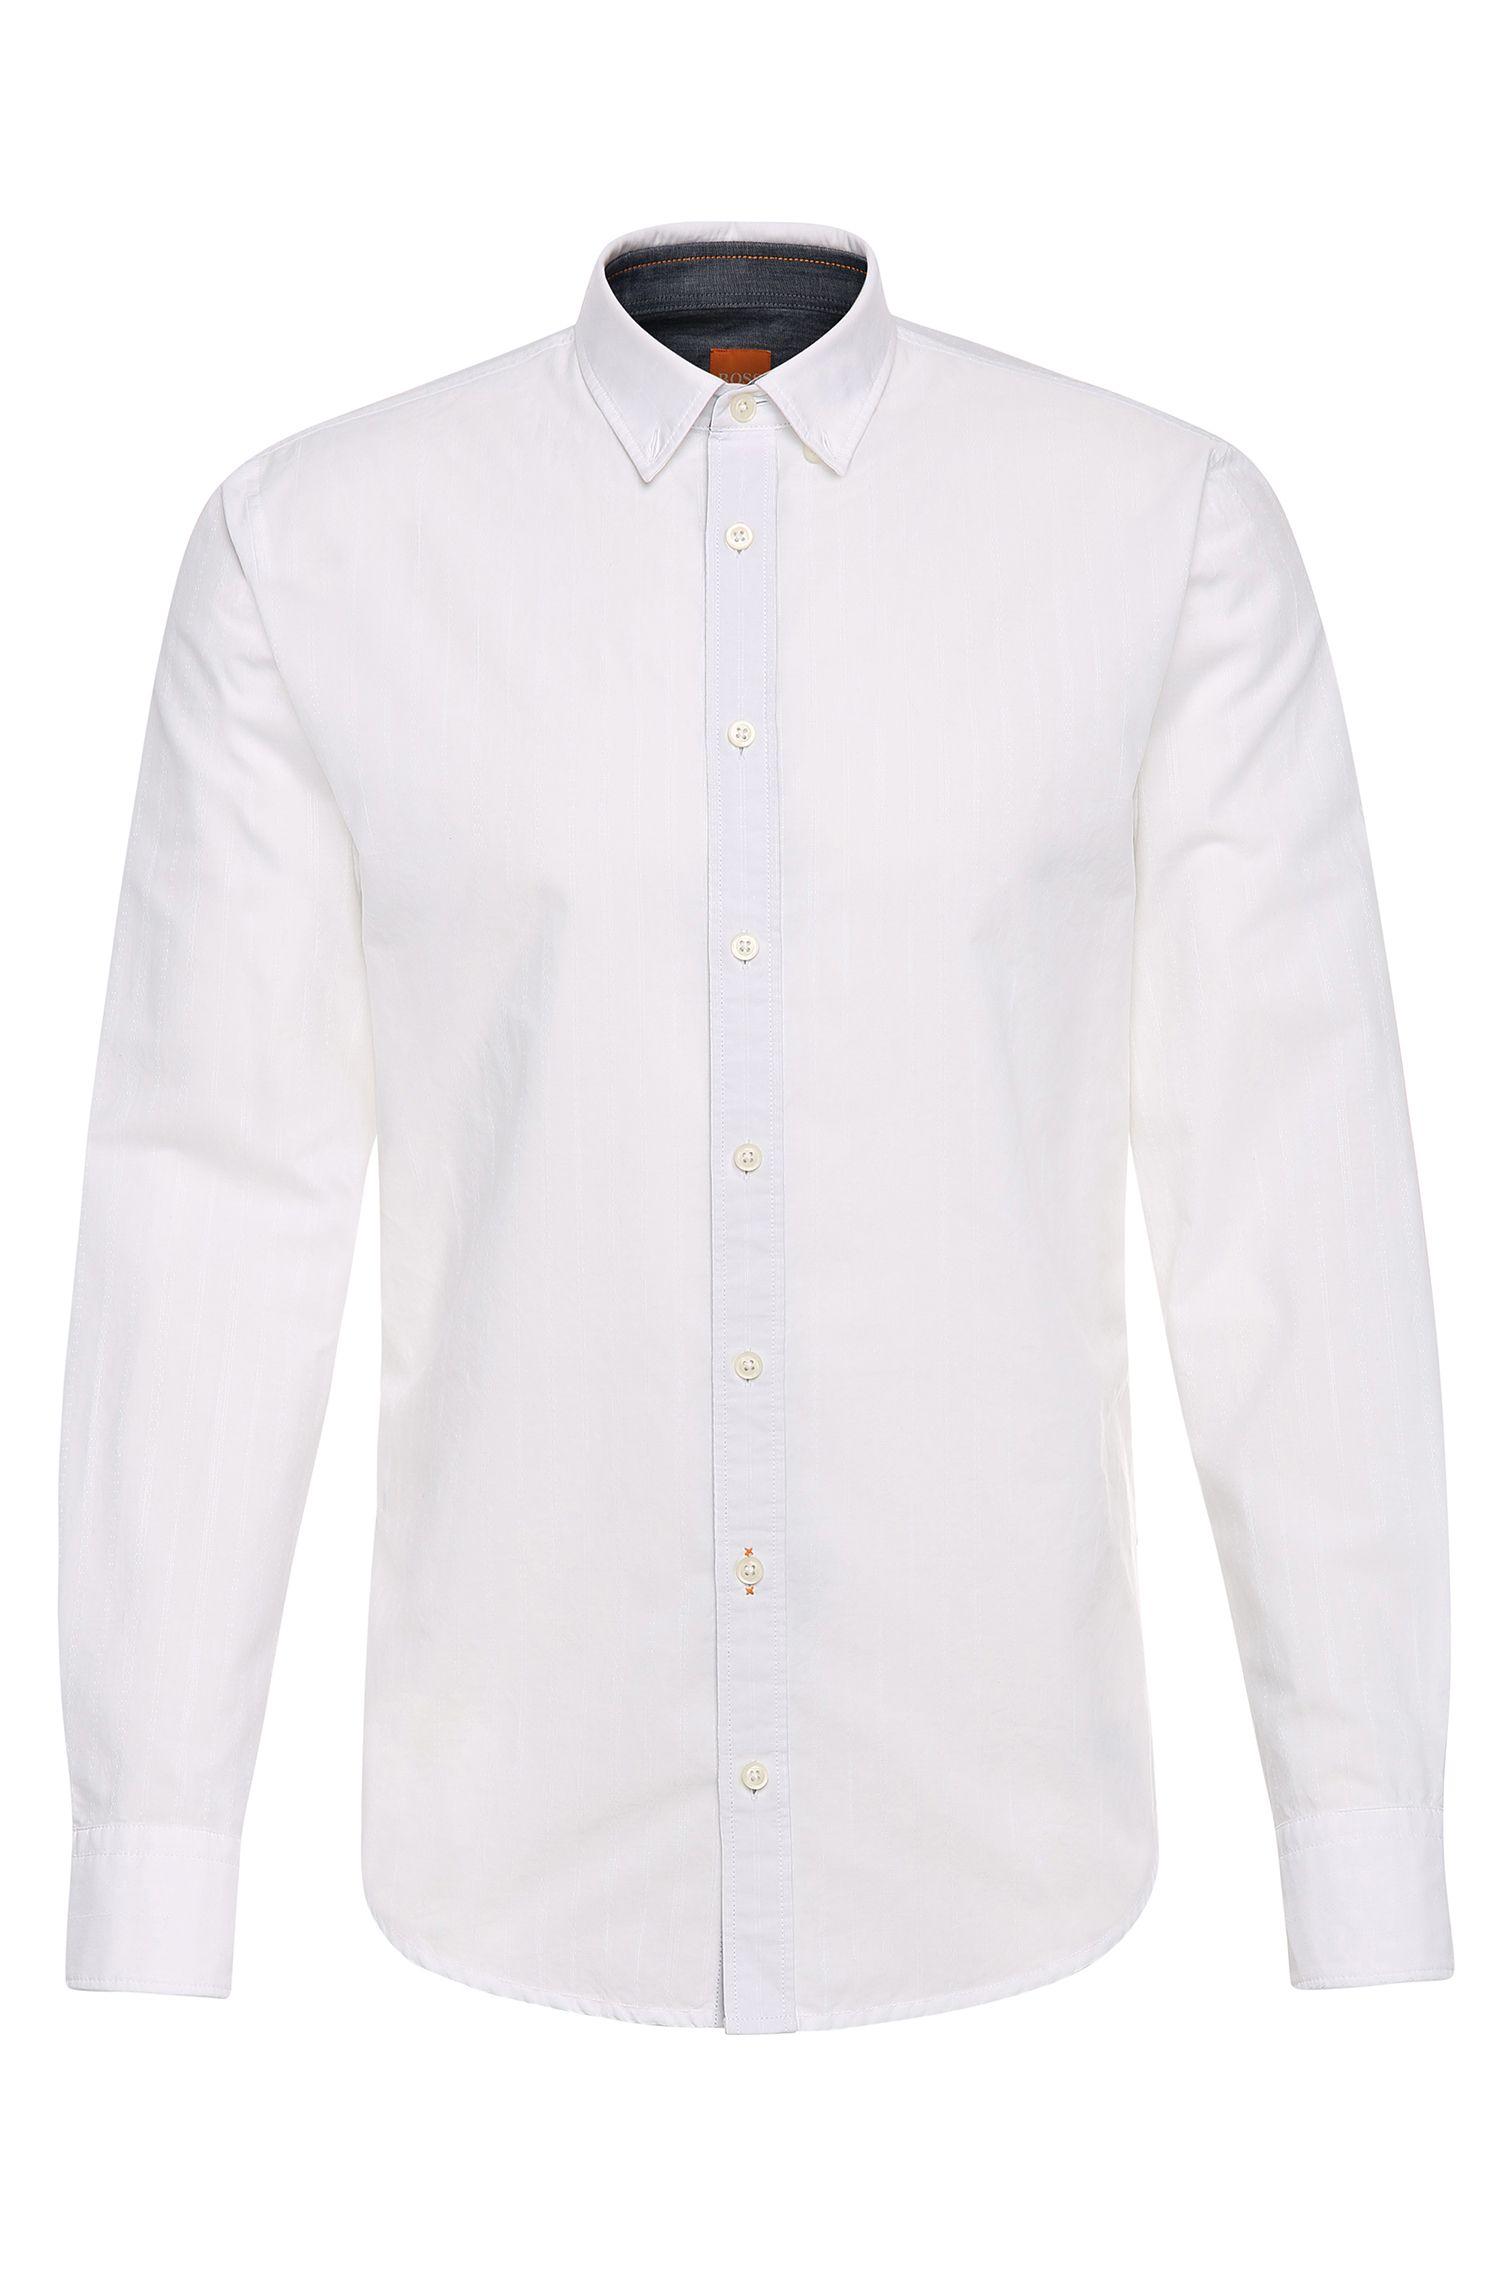 Slim-fit shirt in textured cotton: 'EdipoE'